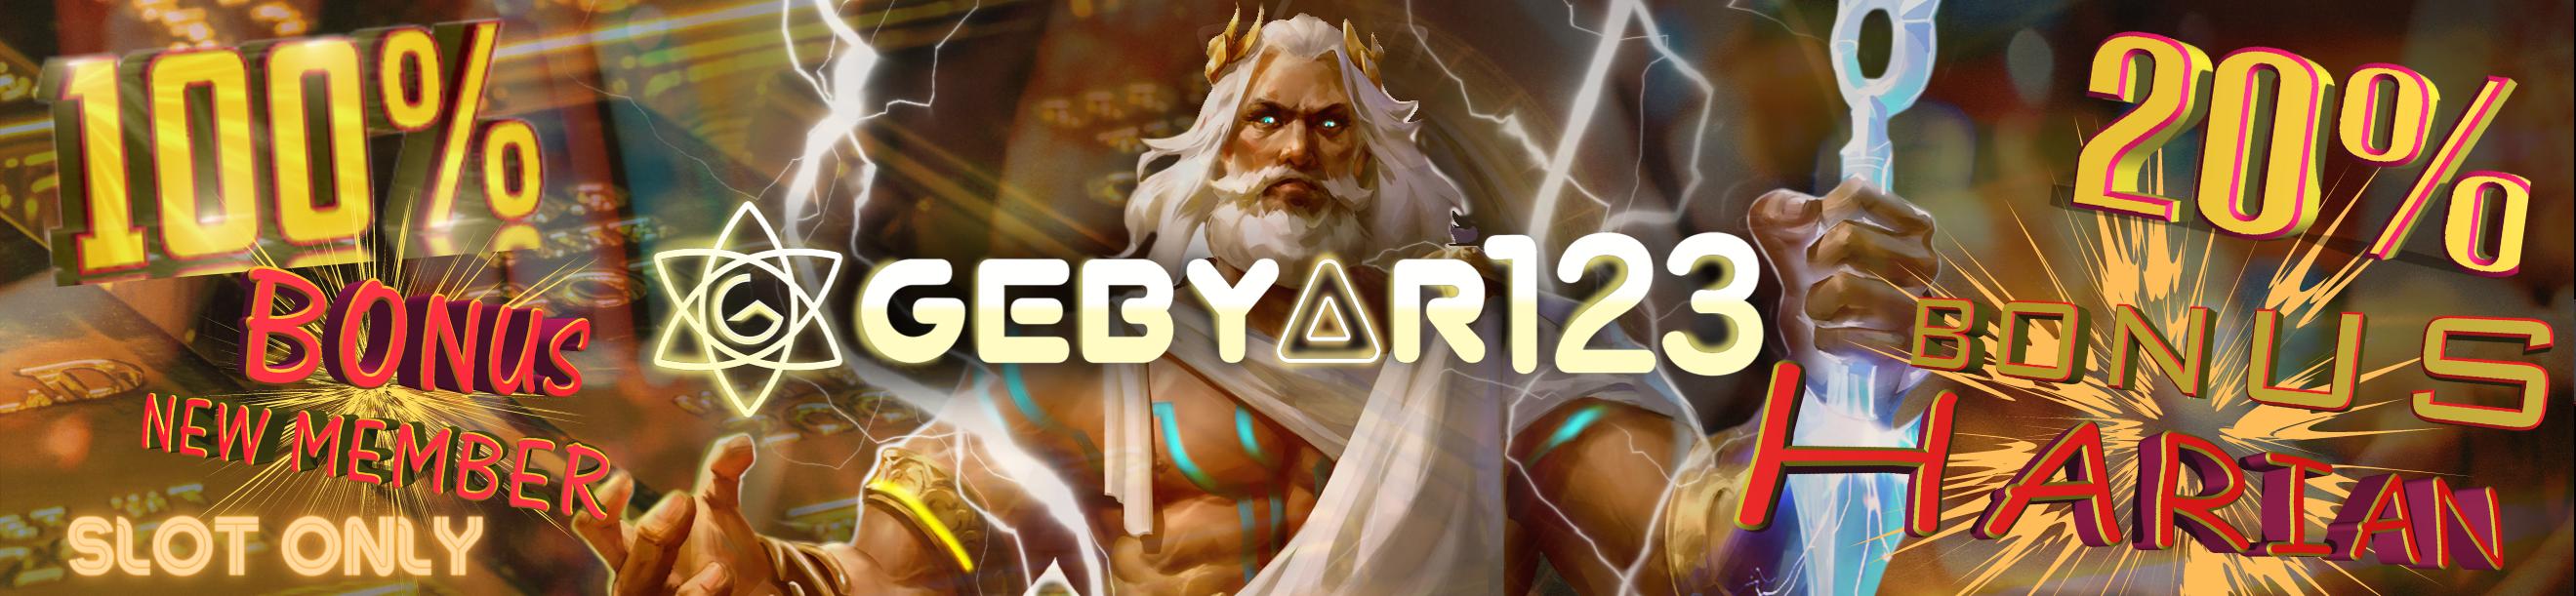 GEBYAR123   Promo New Member